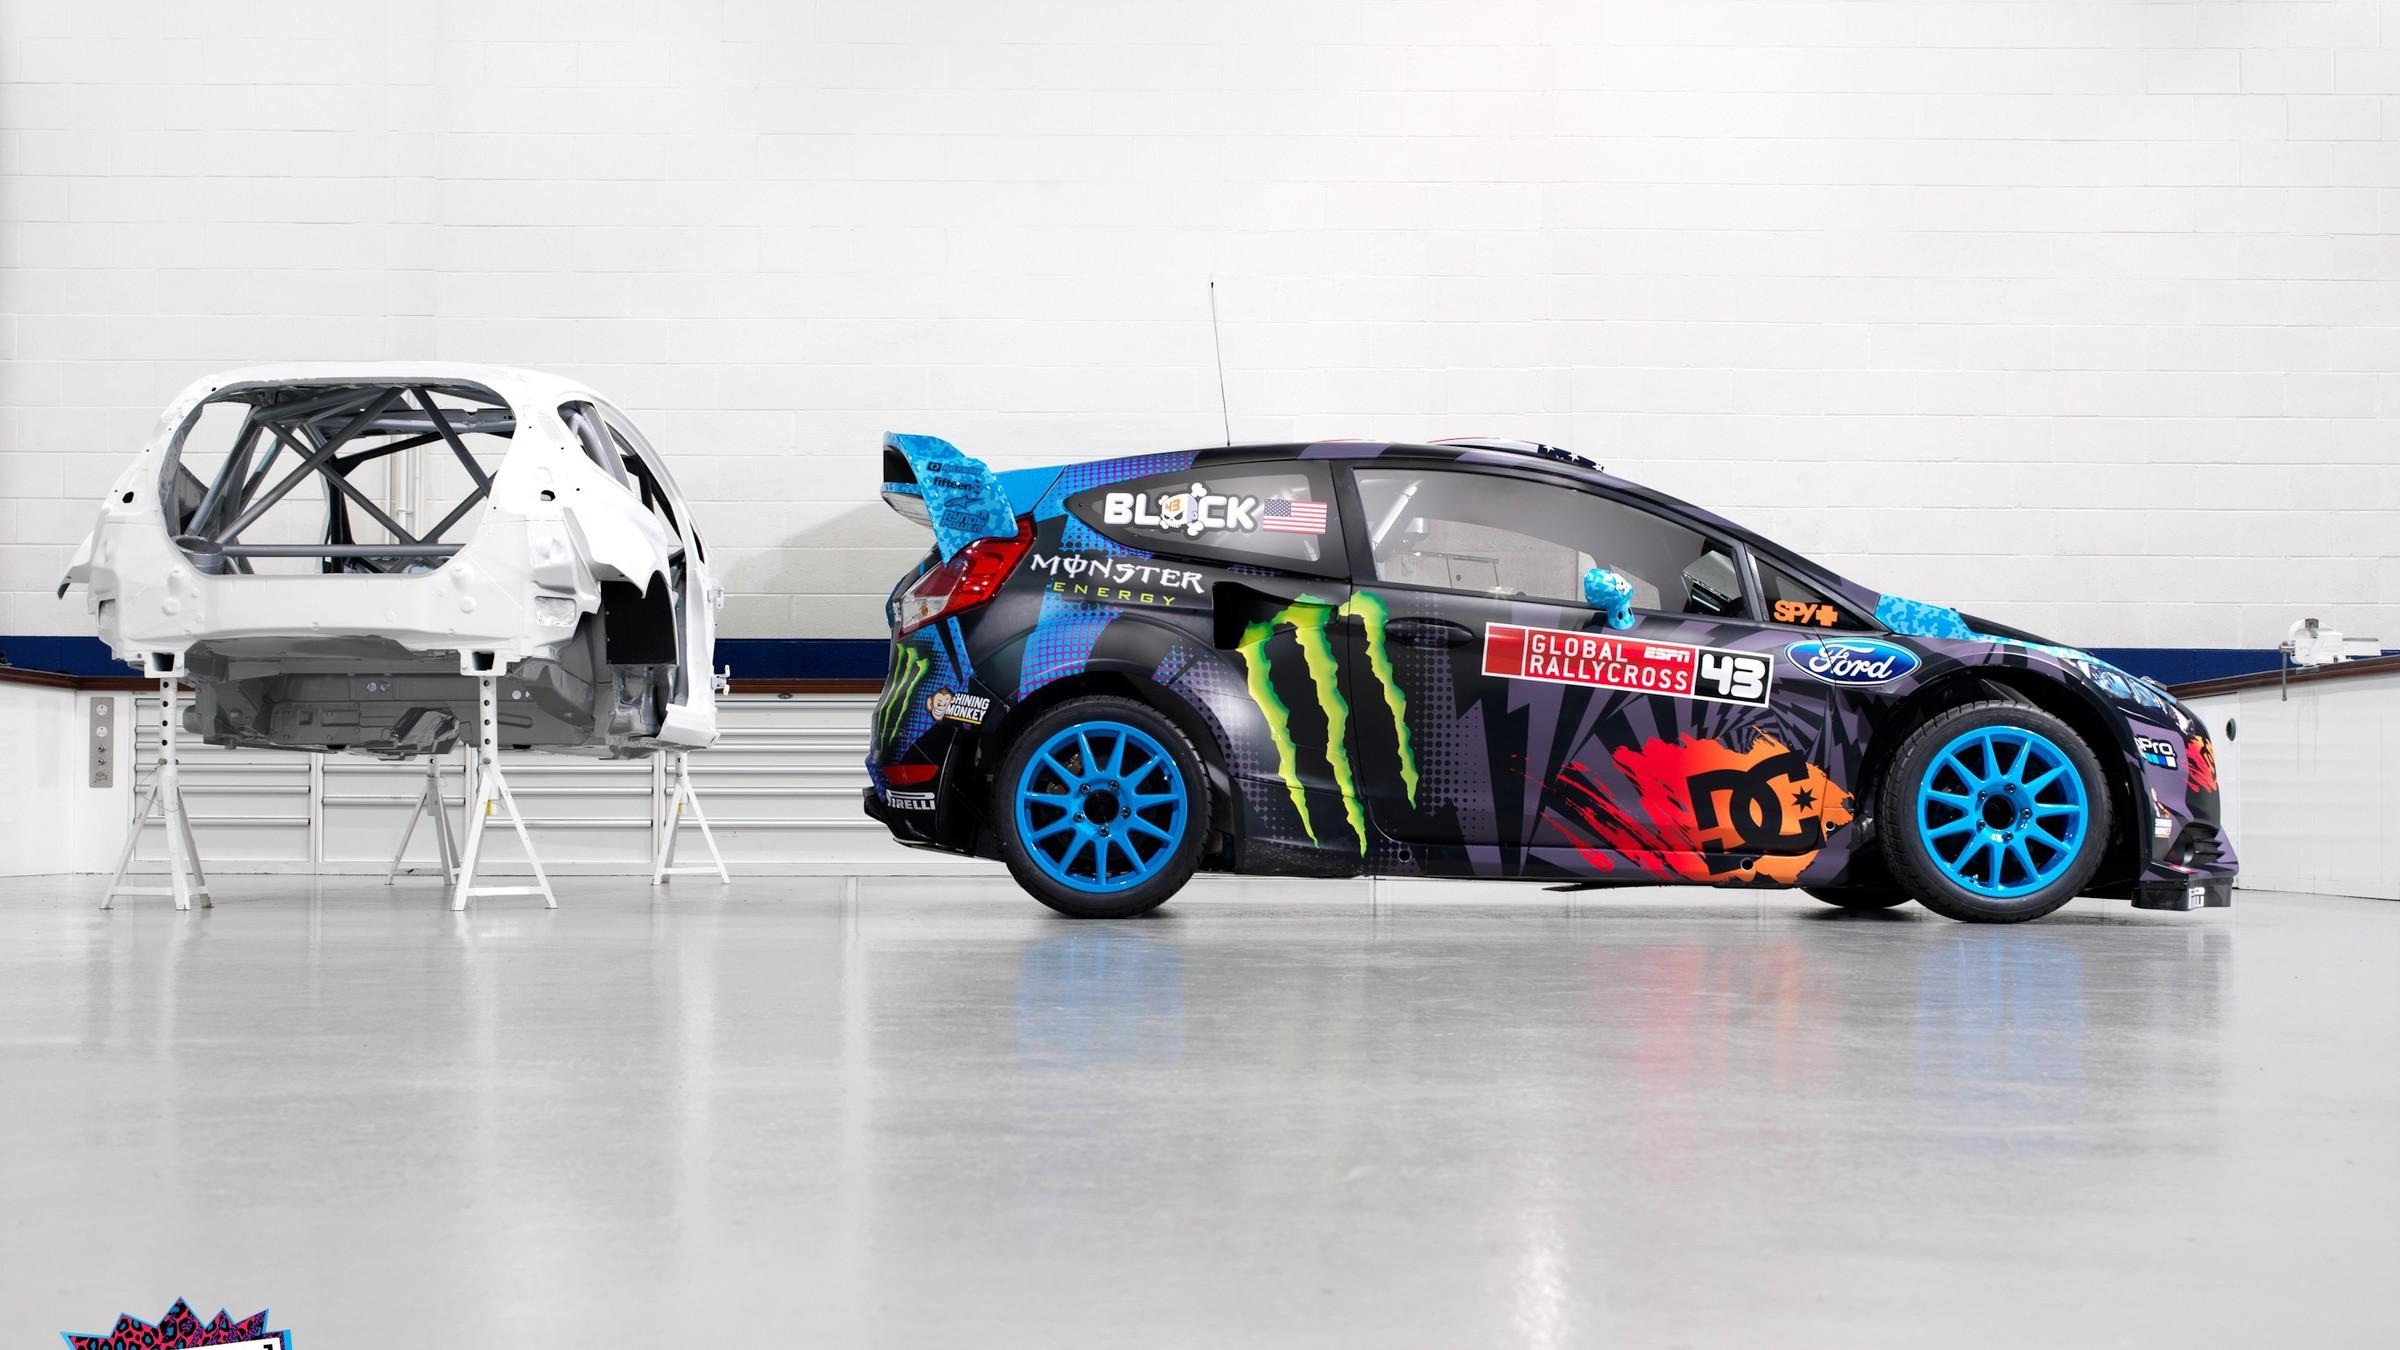 Go pro gopro pirelli racing cars hoonigan wallpaper 2400x1350